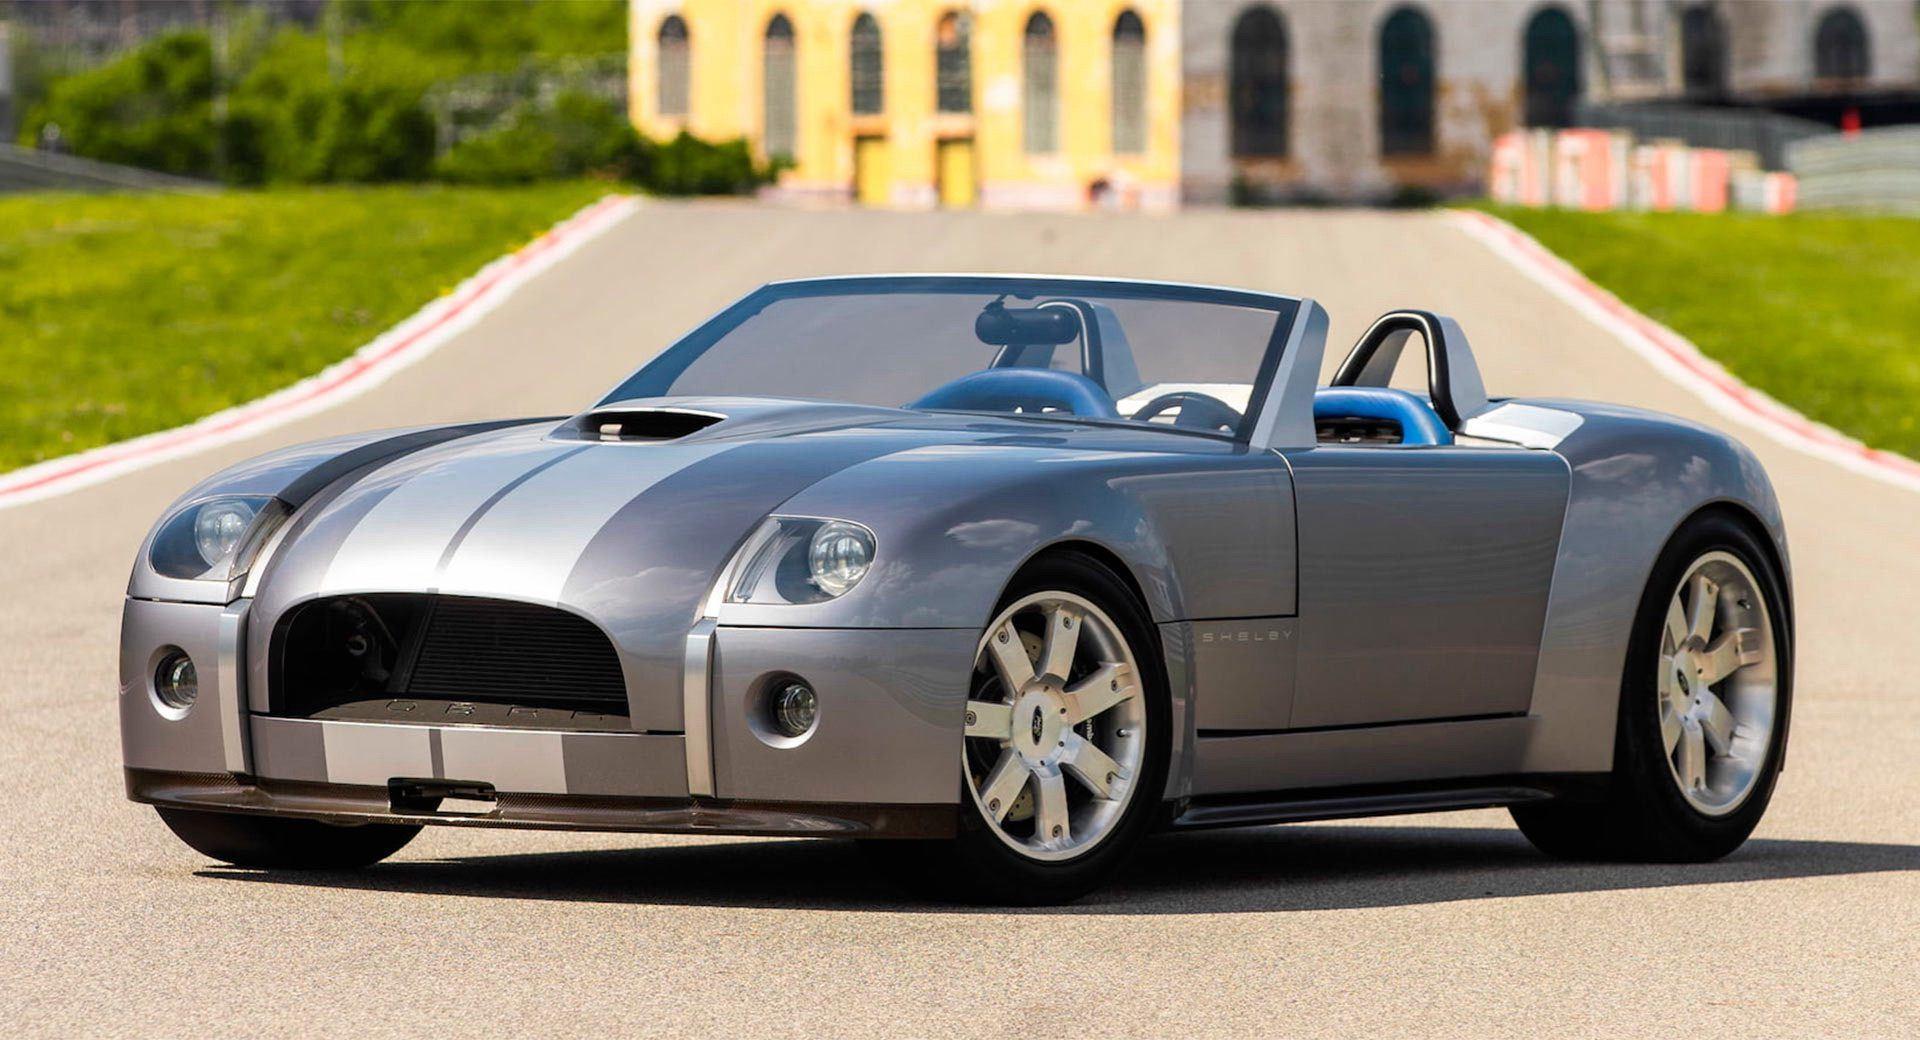 2004_Ford_Shelby_Cobra_Concept-0000